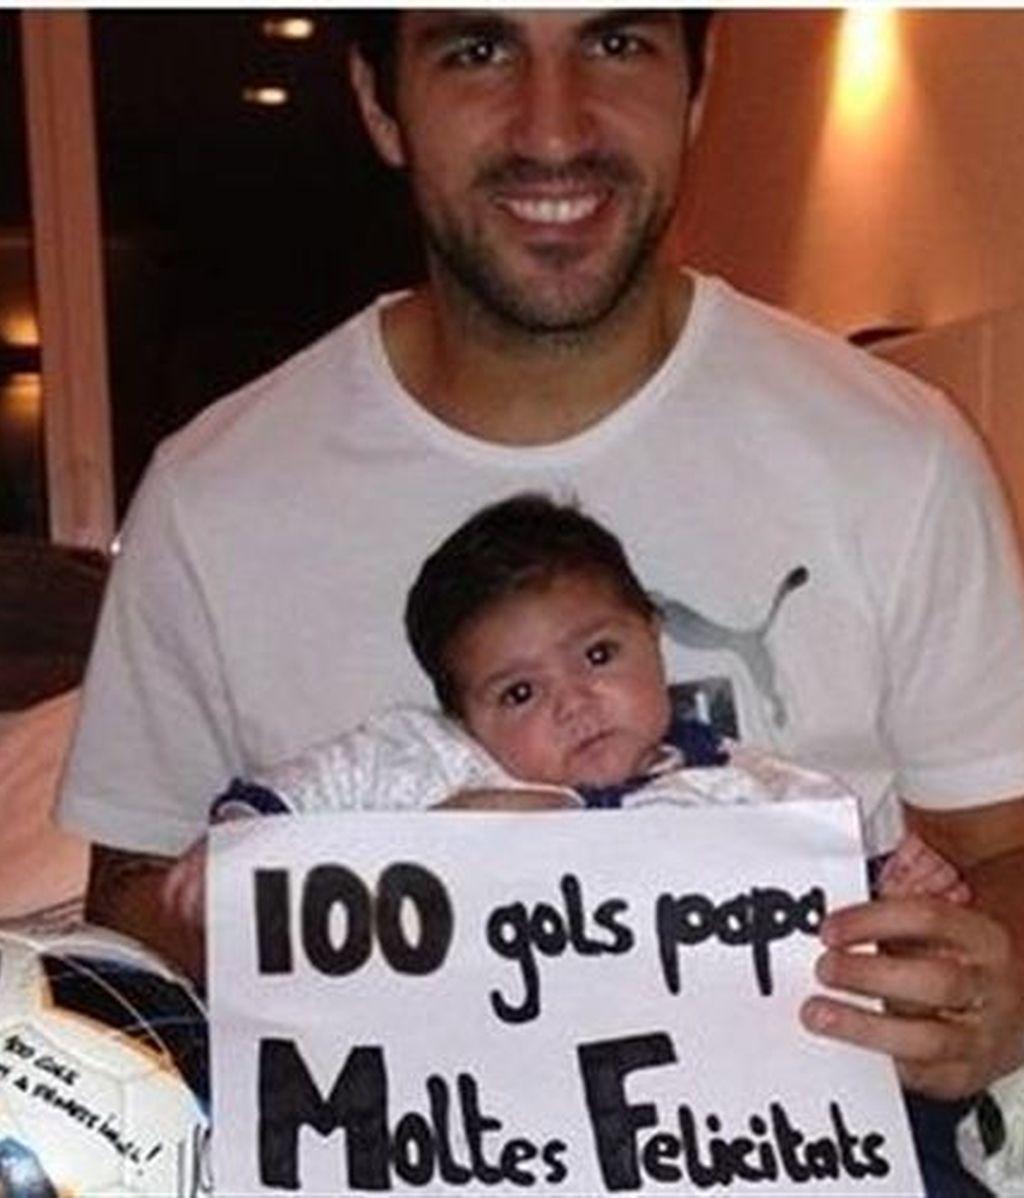 La hija de Cesc Fàbregas felicita a su padre por sus 100 goles